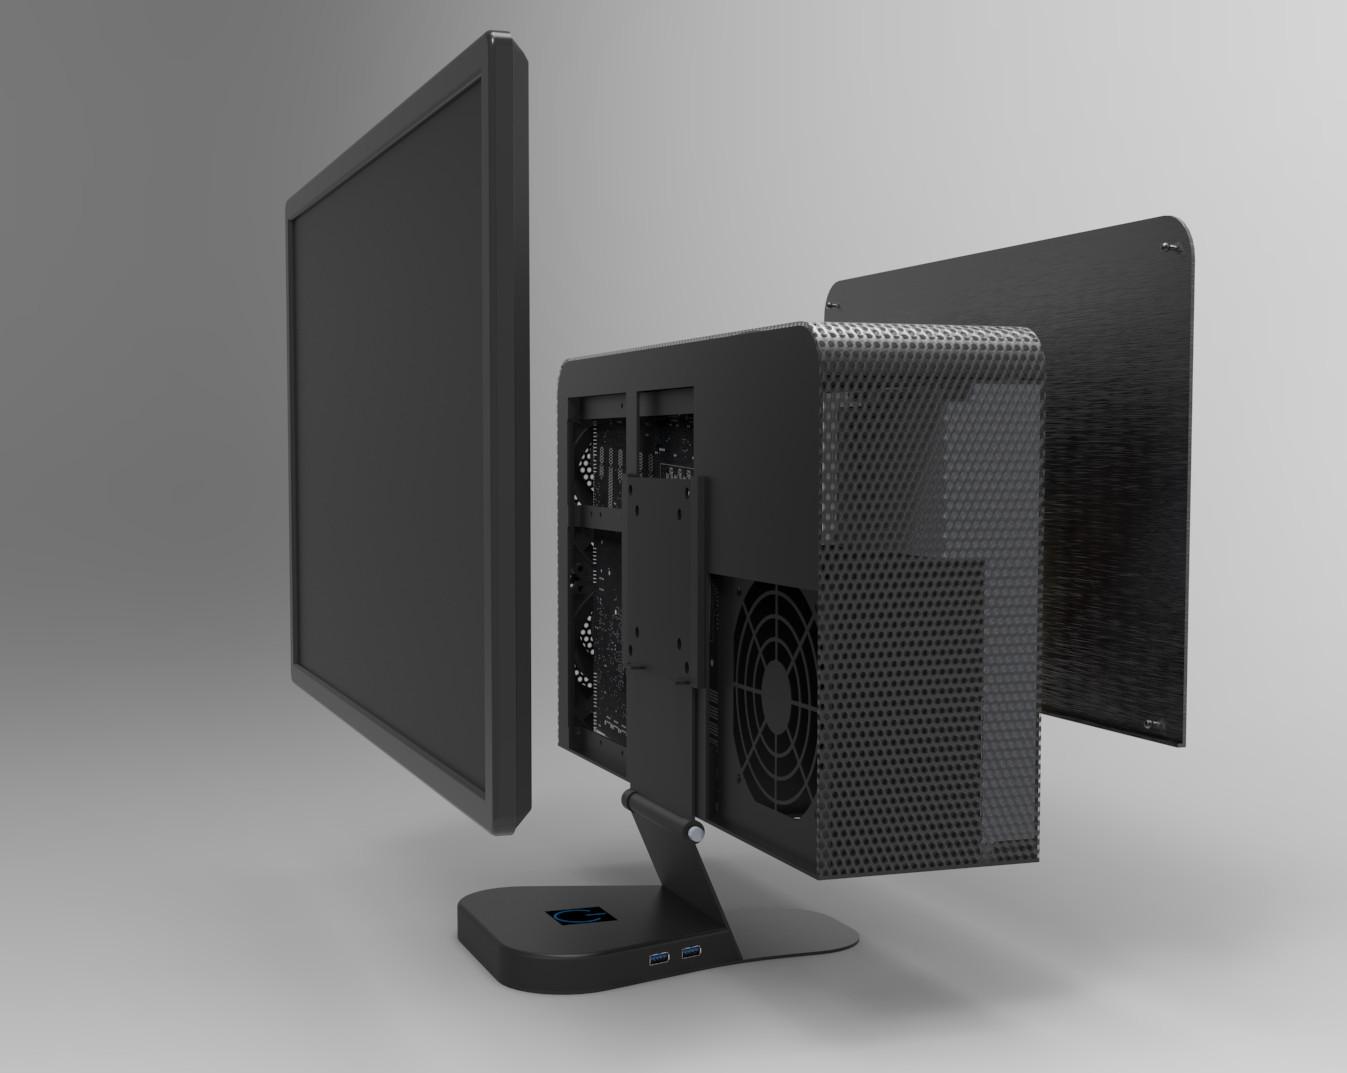 Crono Labs Designs Case Transforming Monitors Into Monster